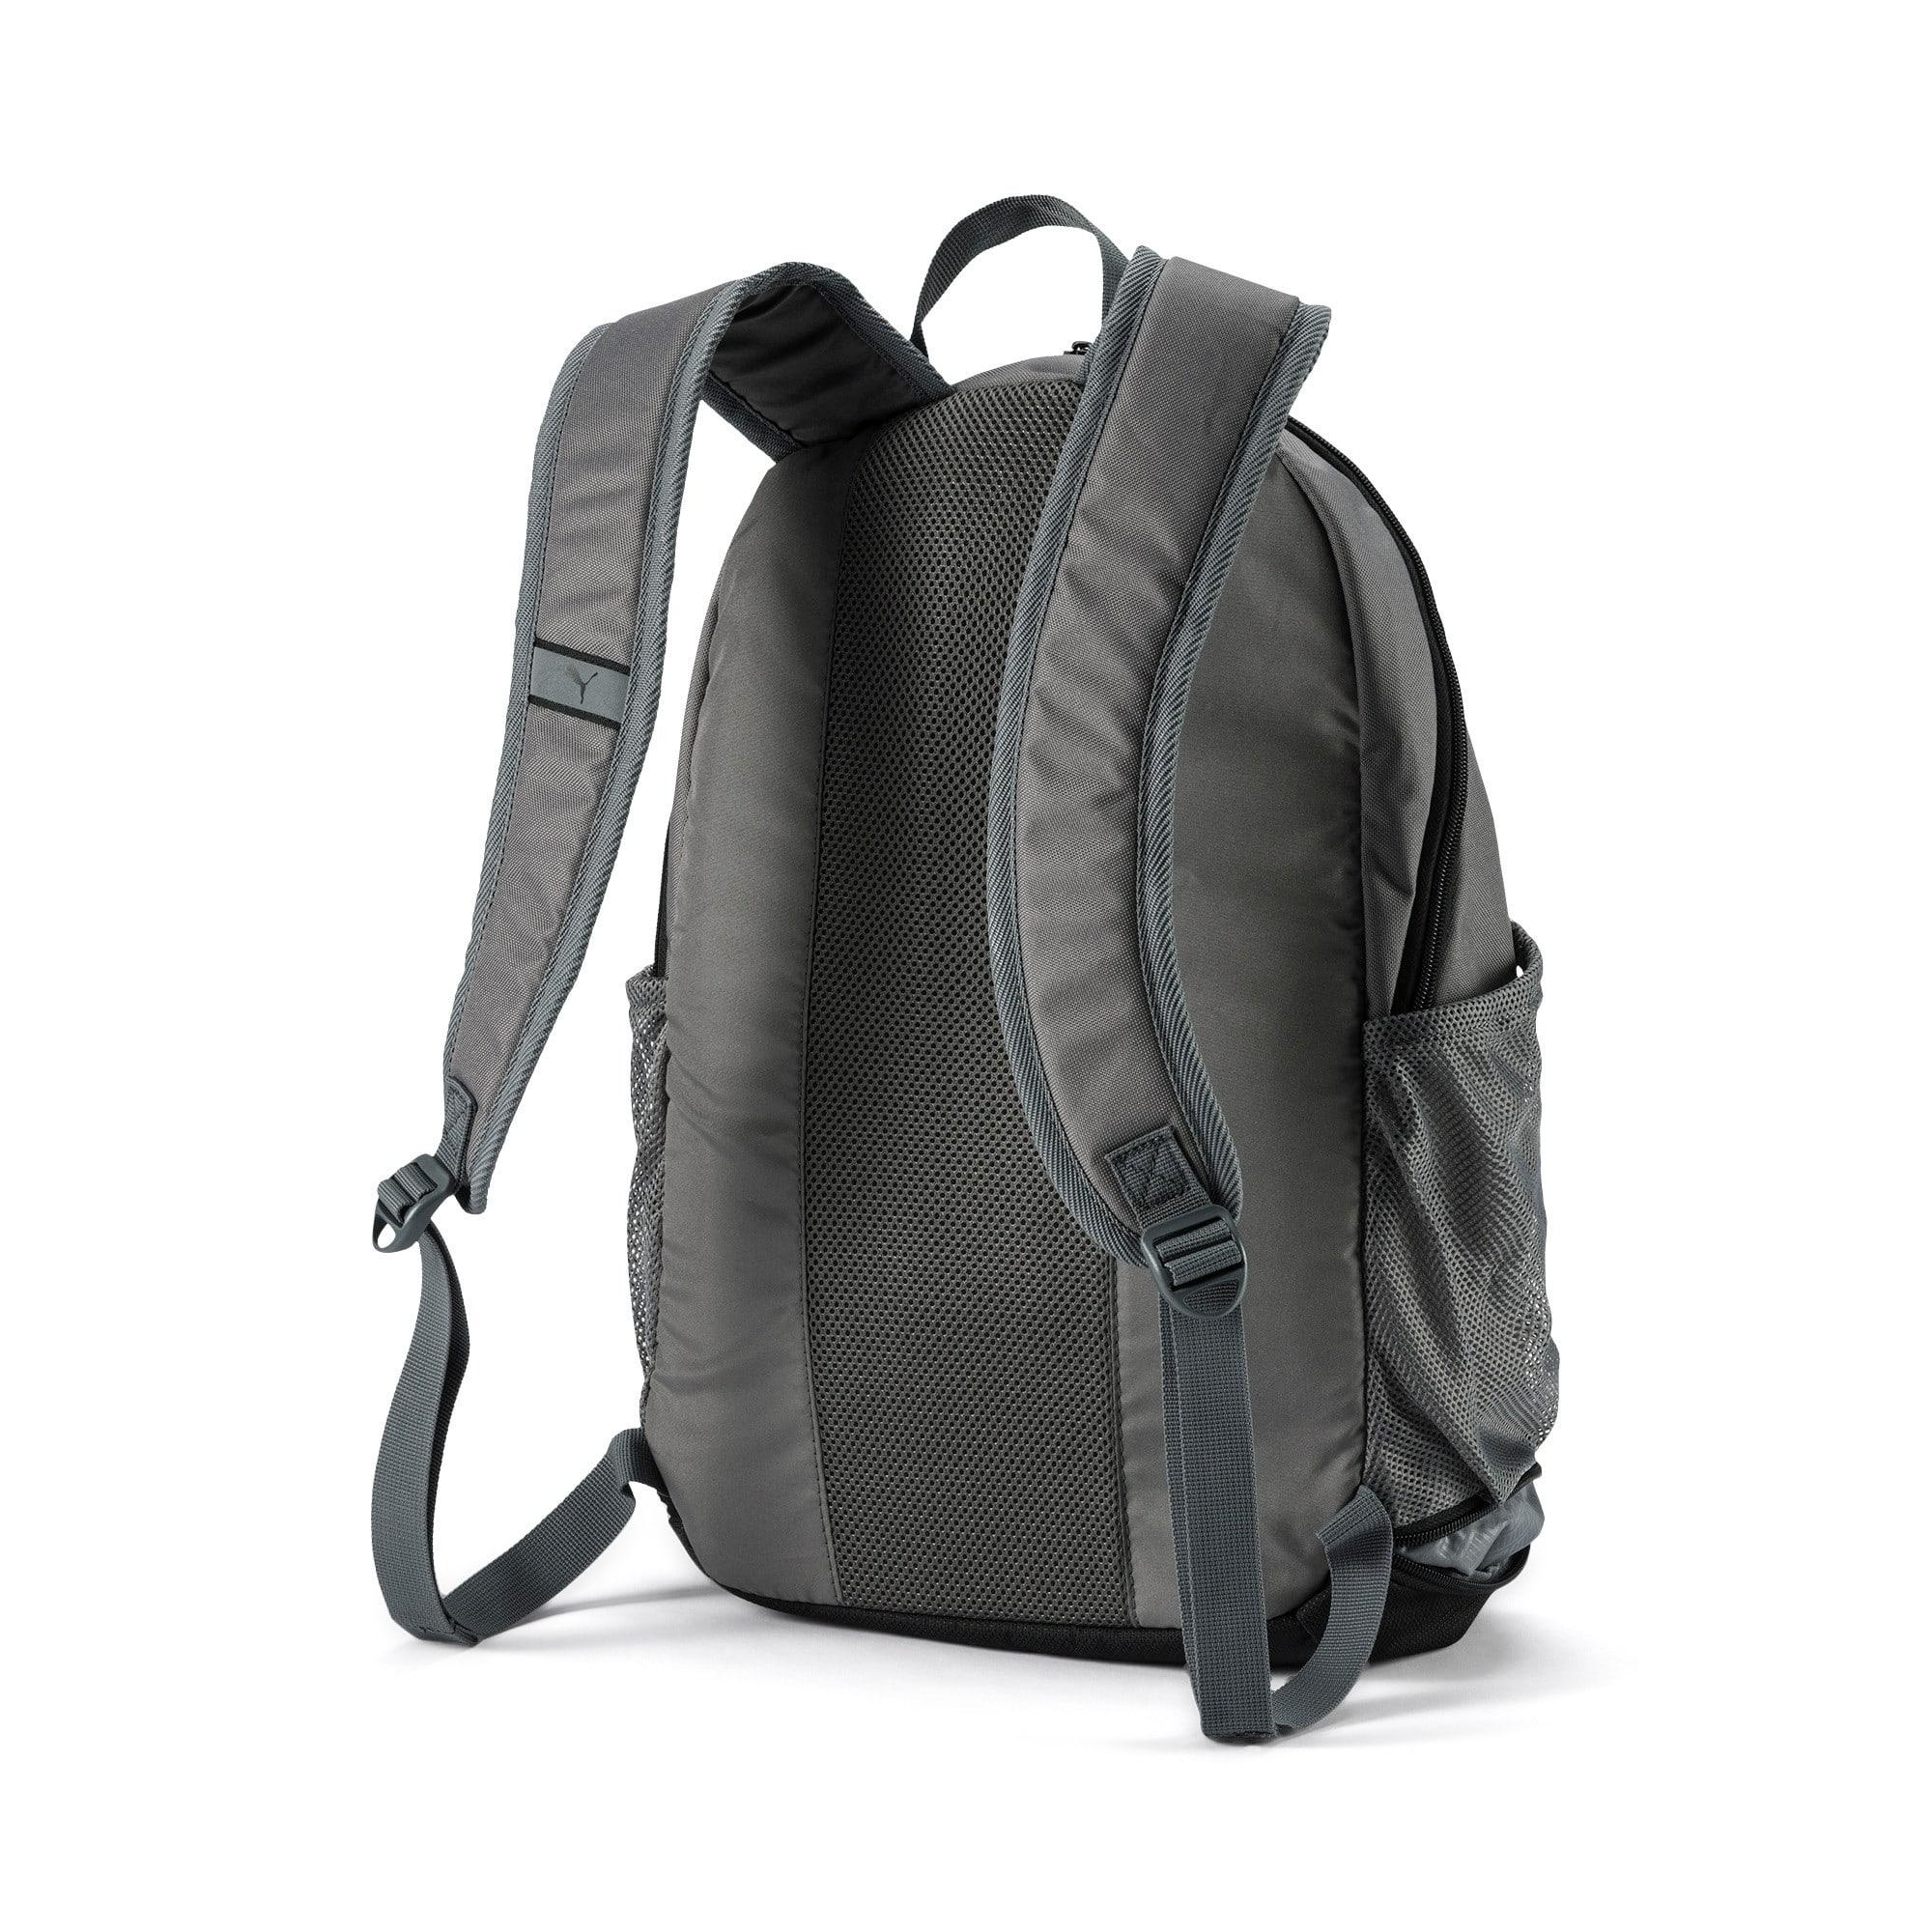 Thumbnail 2 of Vibe Backpack, CASTLEROCK, medium